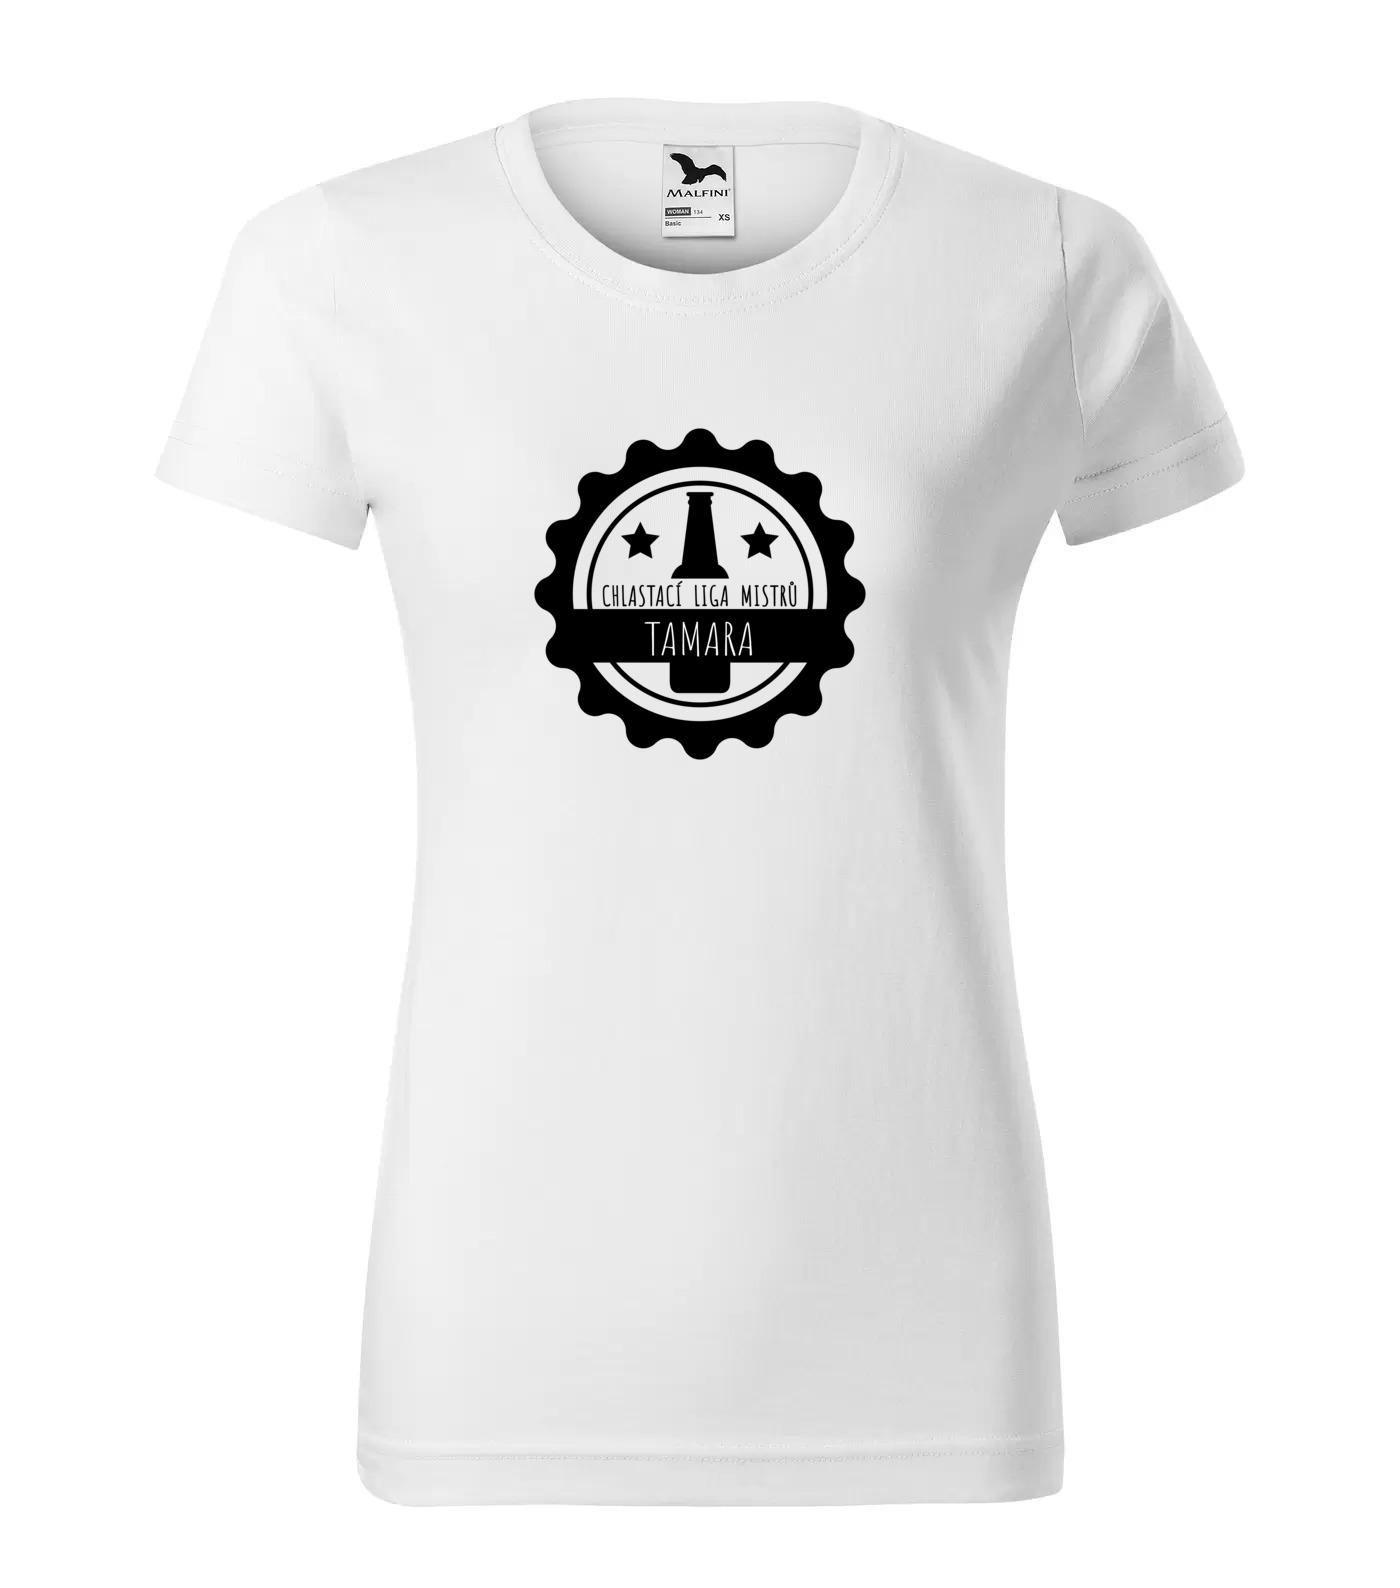 Tričko Chlastací liga žen Tamara